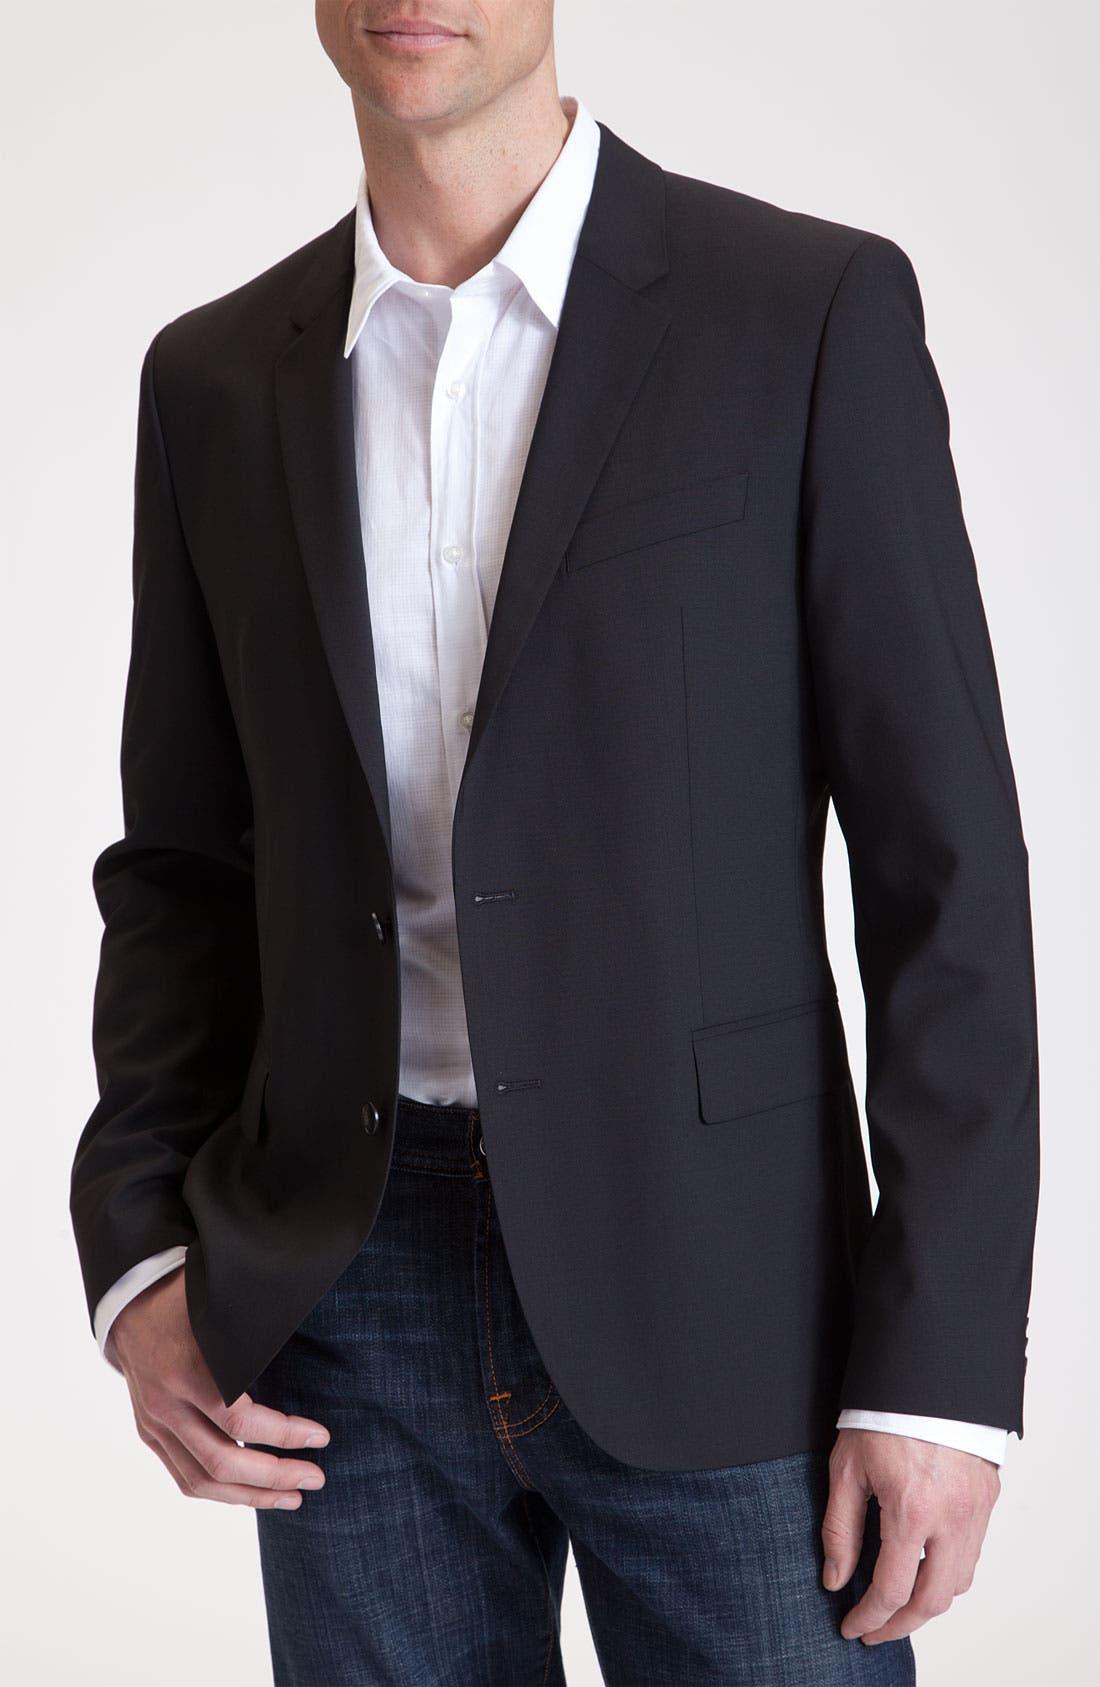 Alternate Image 1 Selected - HUGO 'Amares' Stretch Wool Sportcoat